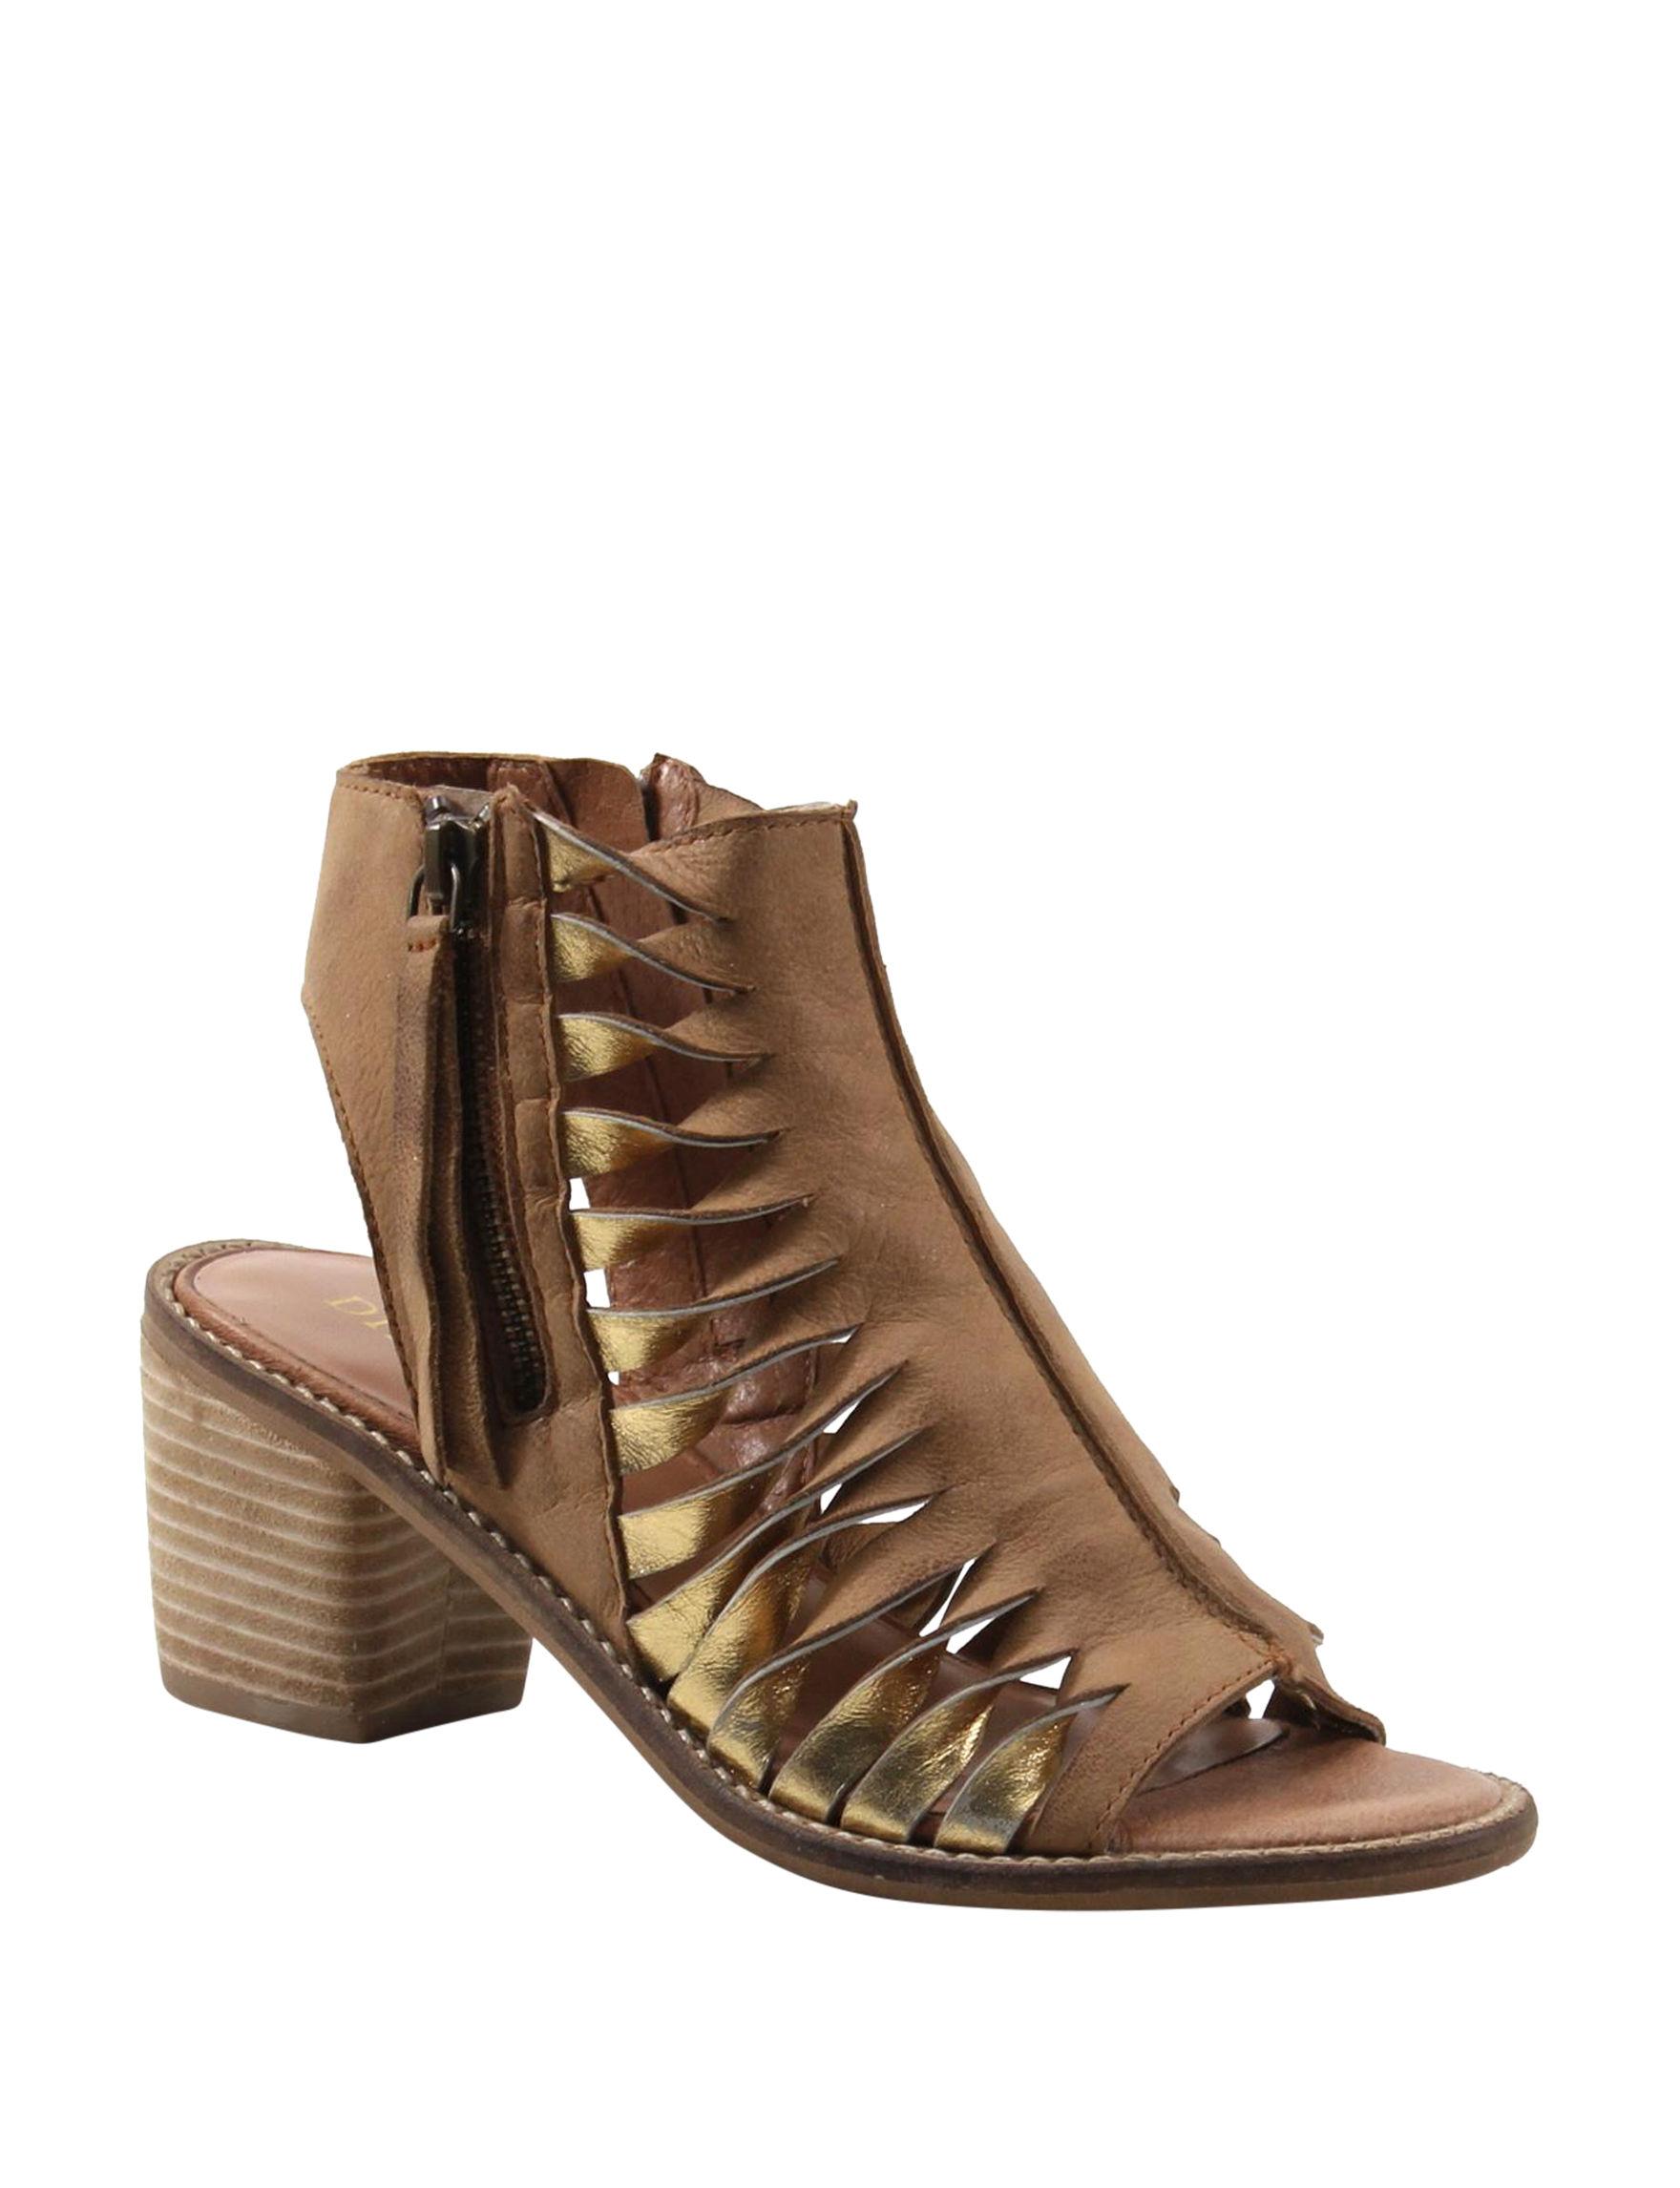 Diba True Tan Heeled Sandals